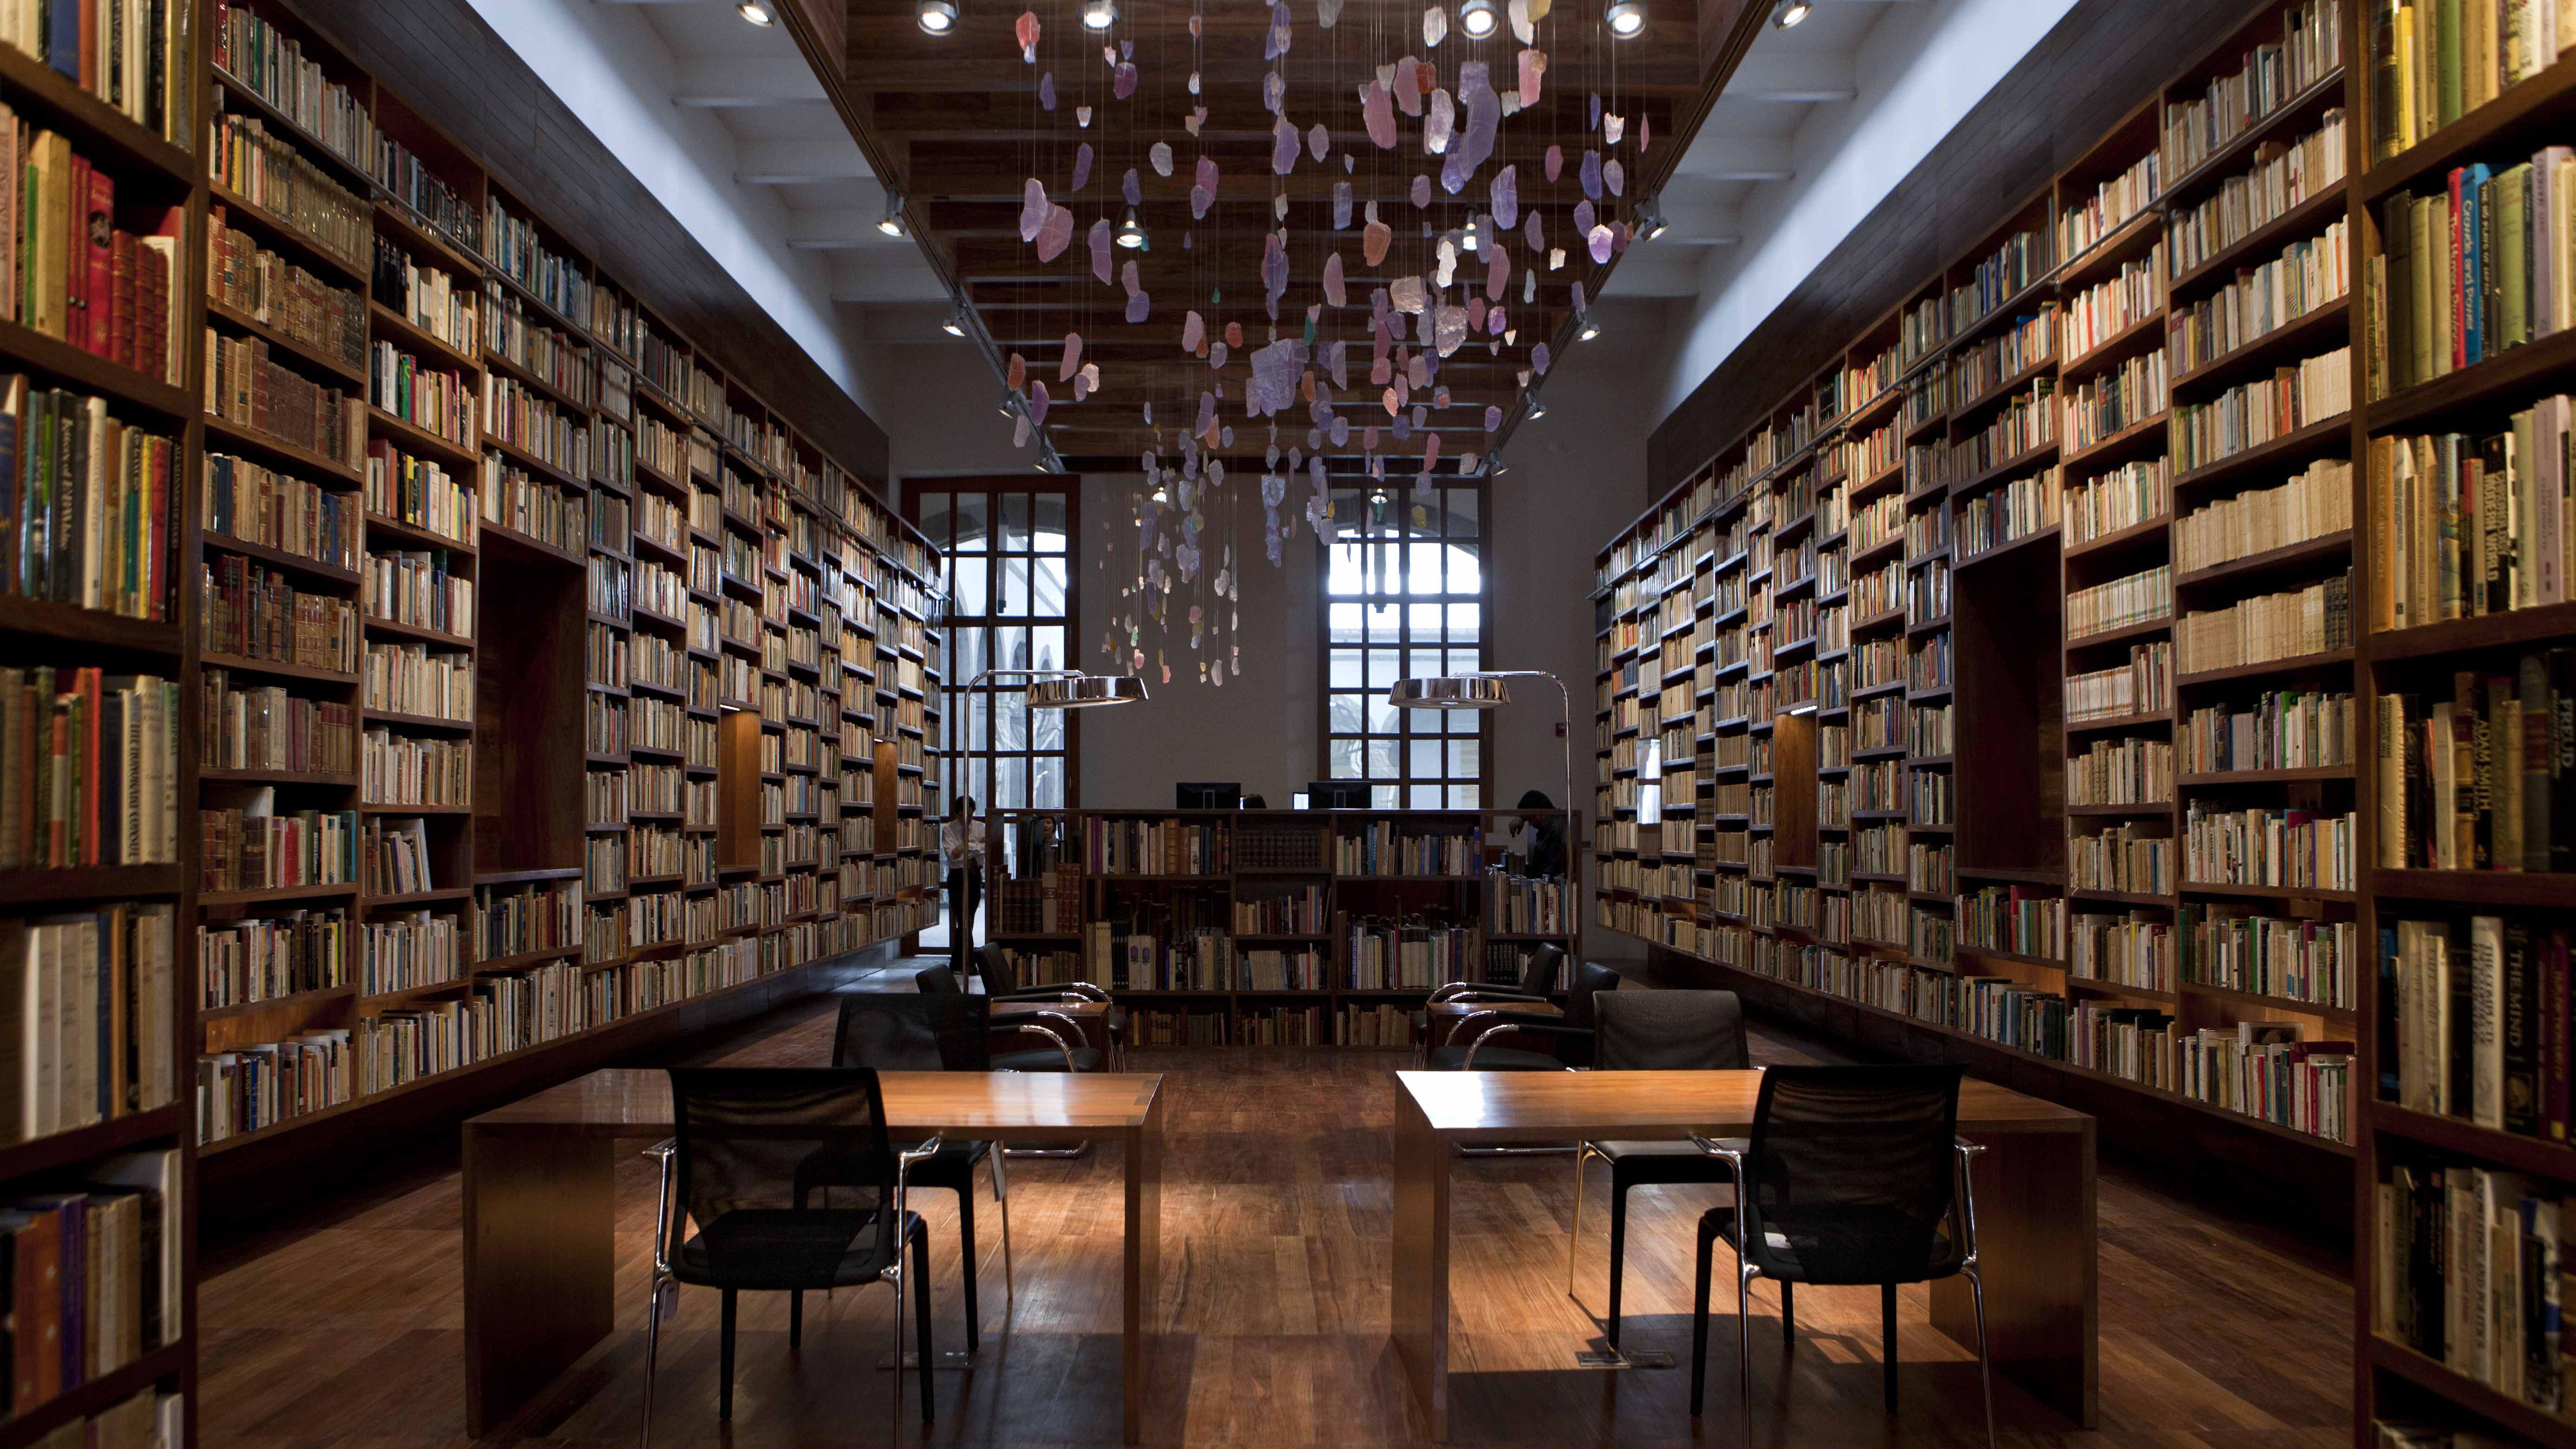 How to find free classic books online — Quartz